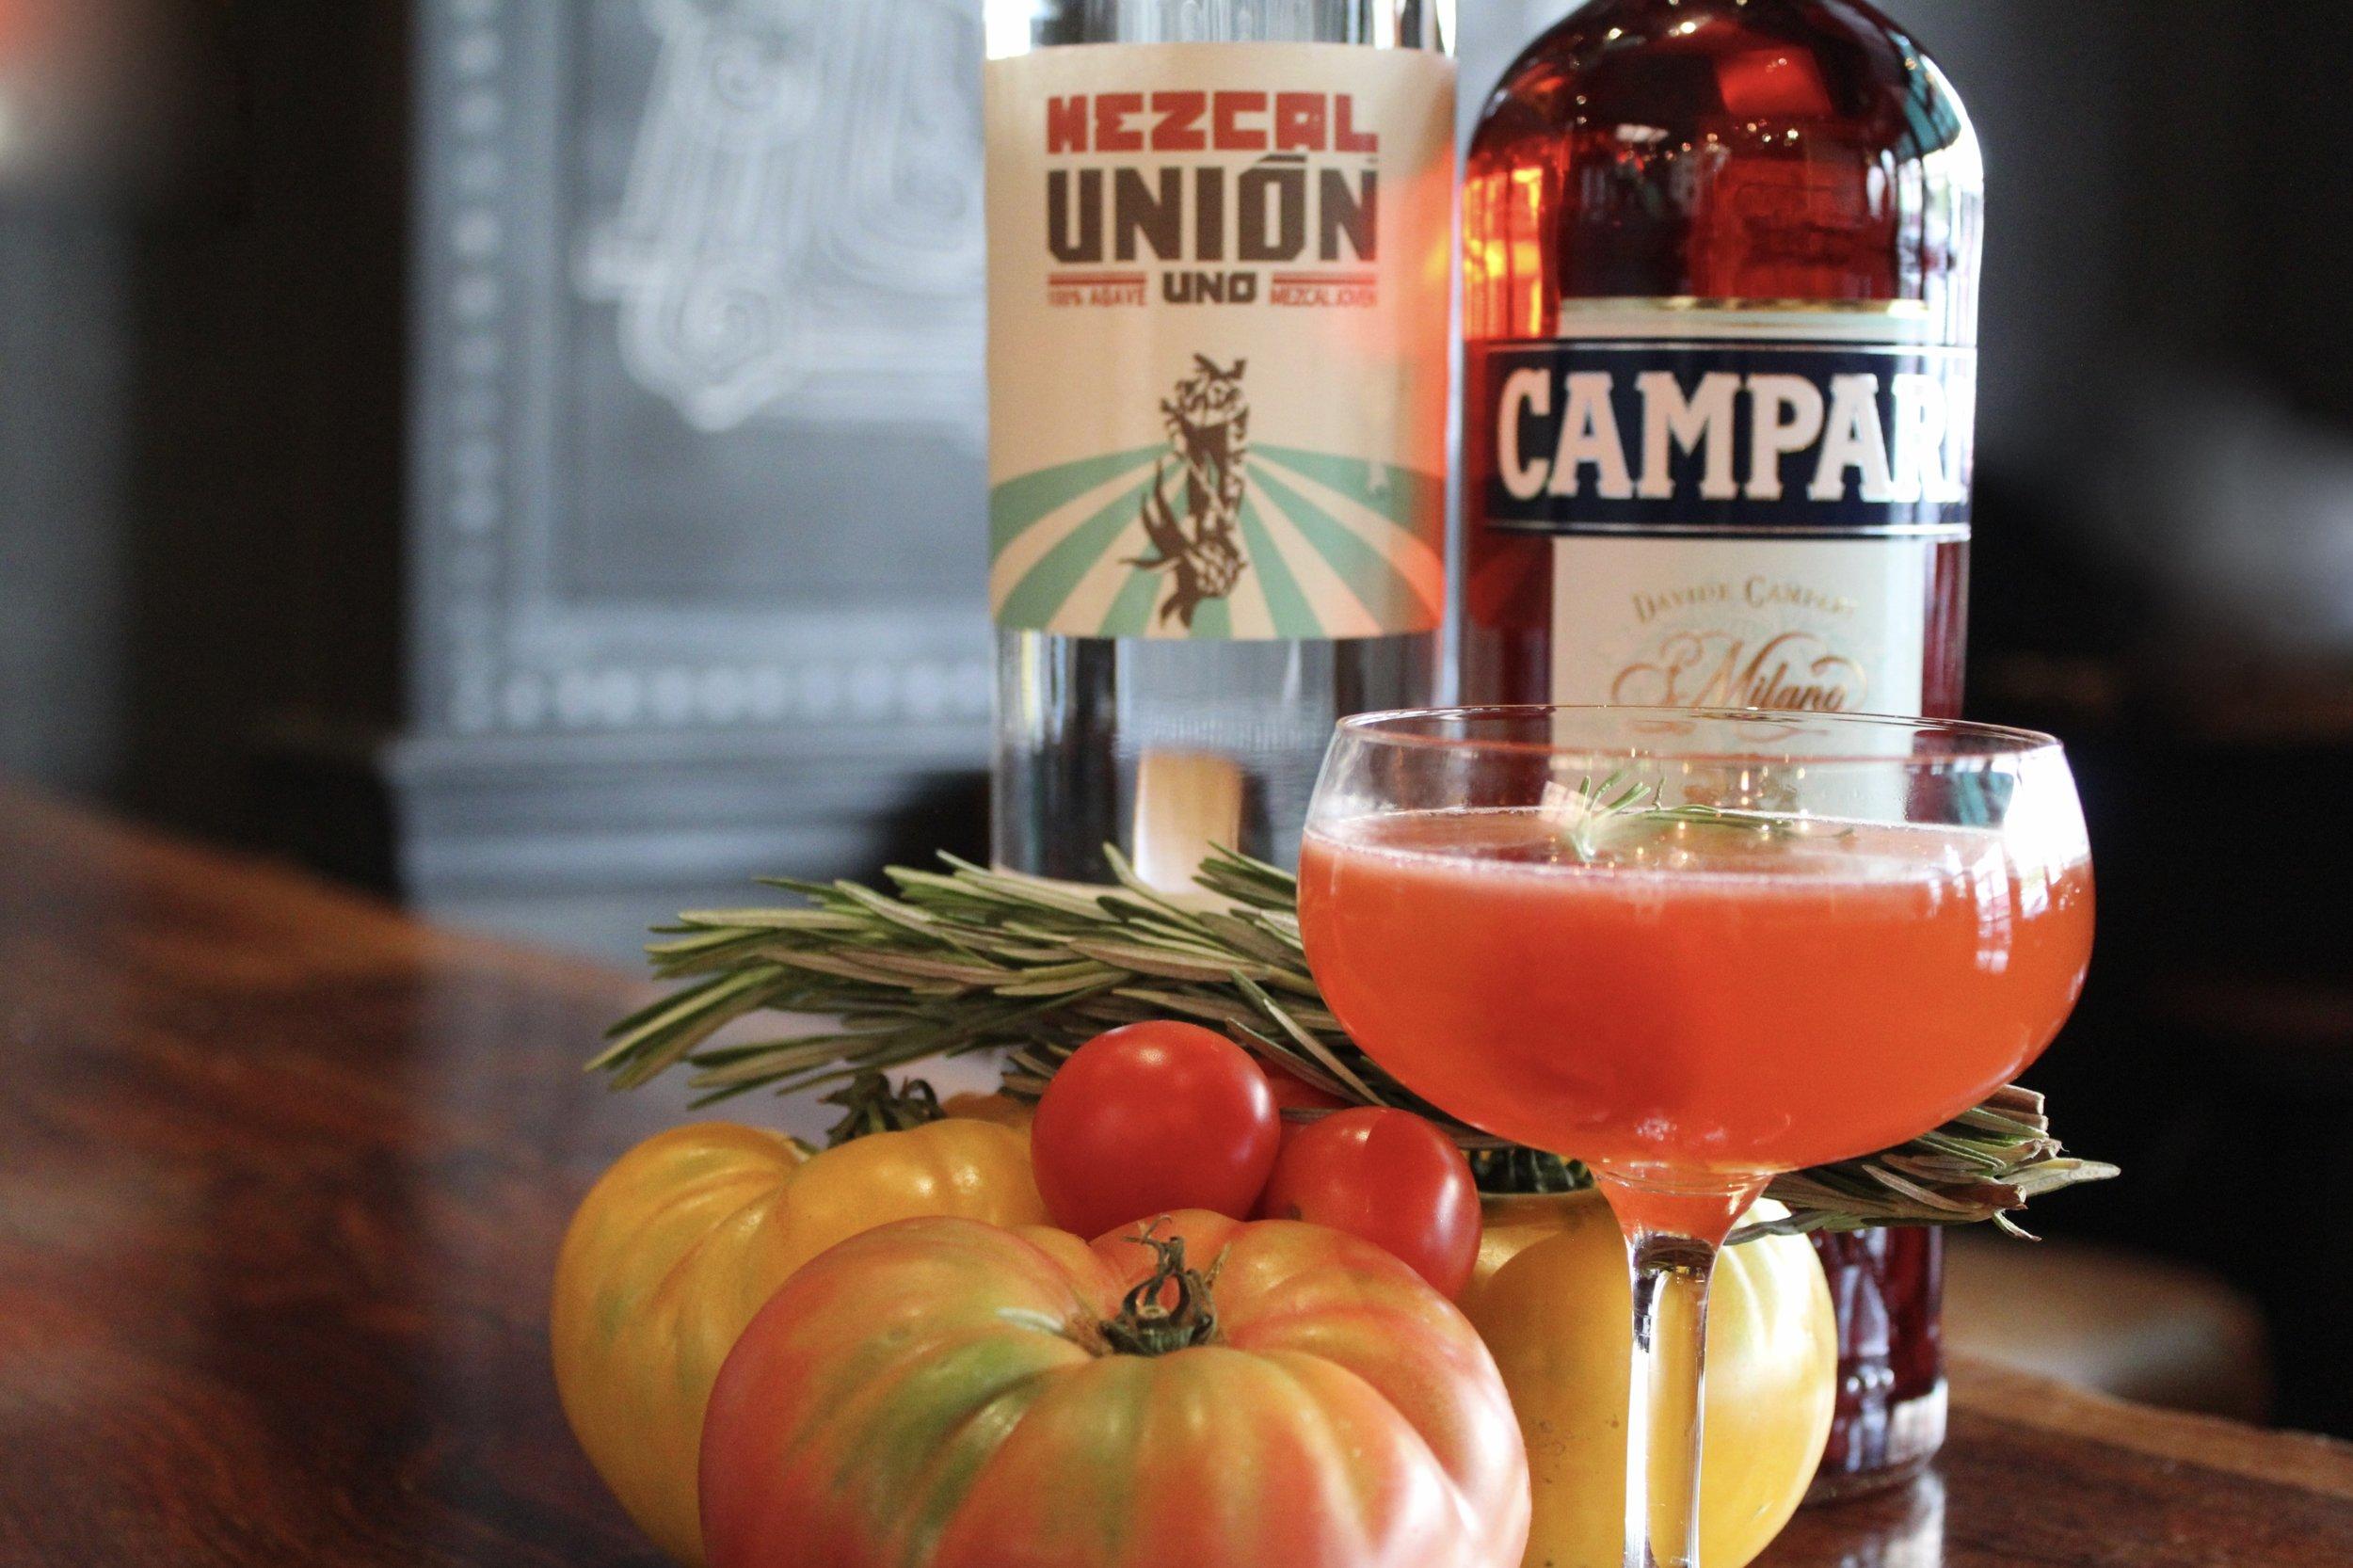 Cocktail and bottles of mezcal